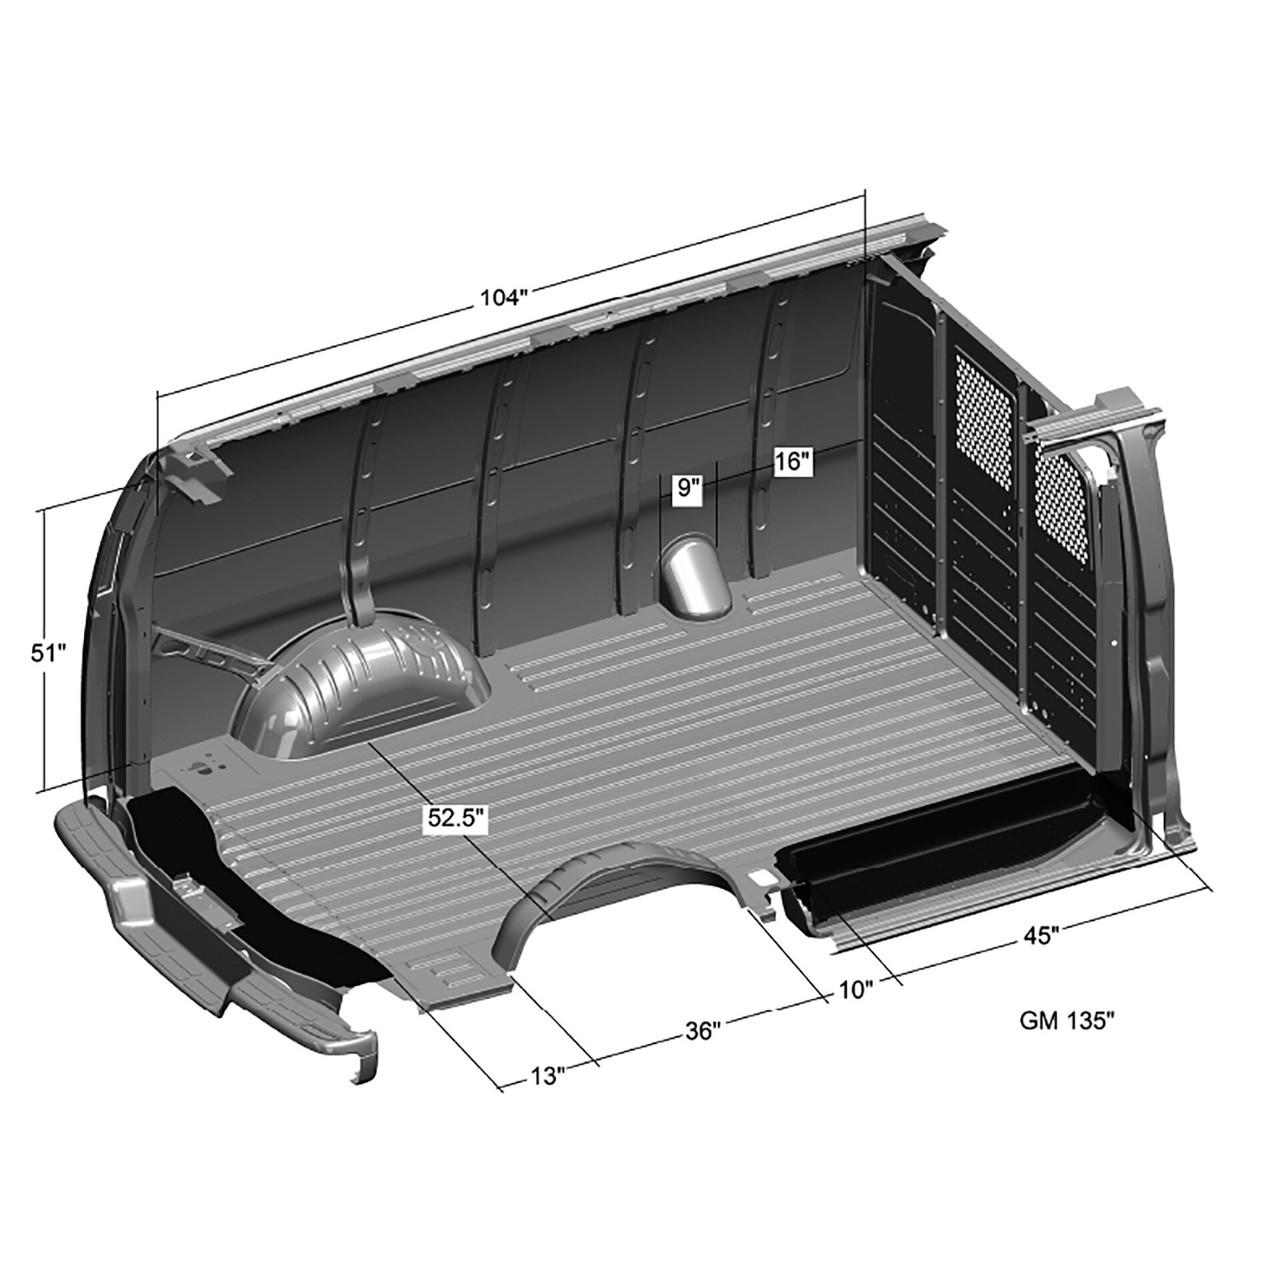 *** GM Van Dimensions